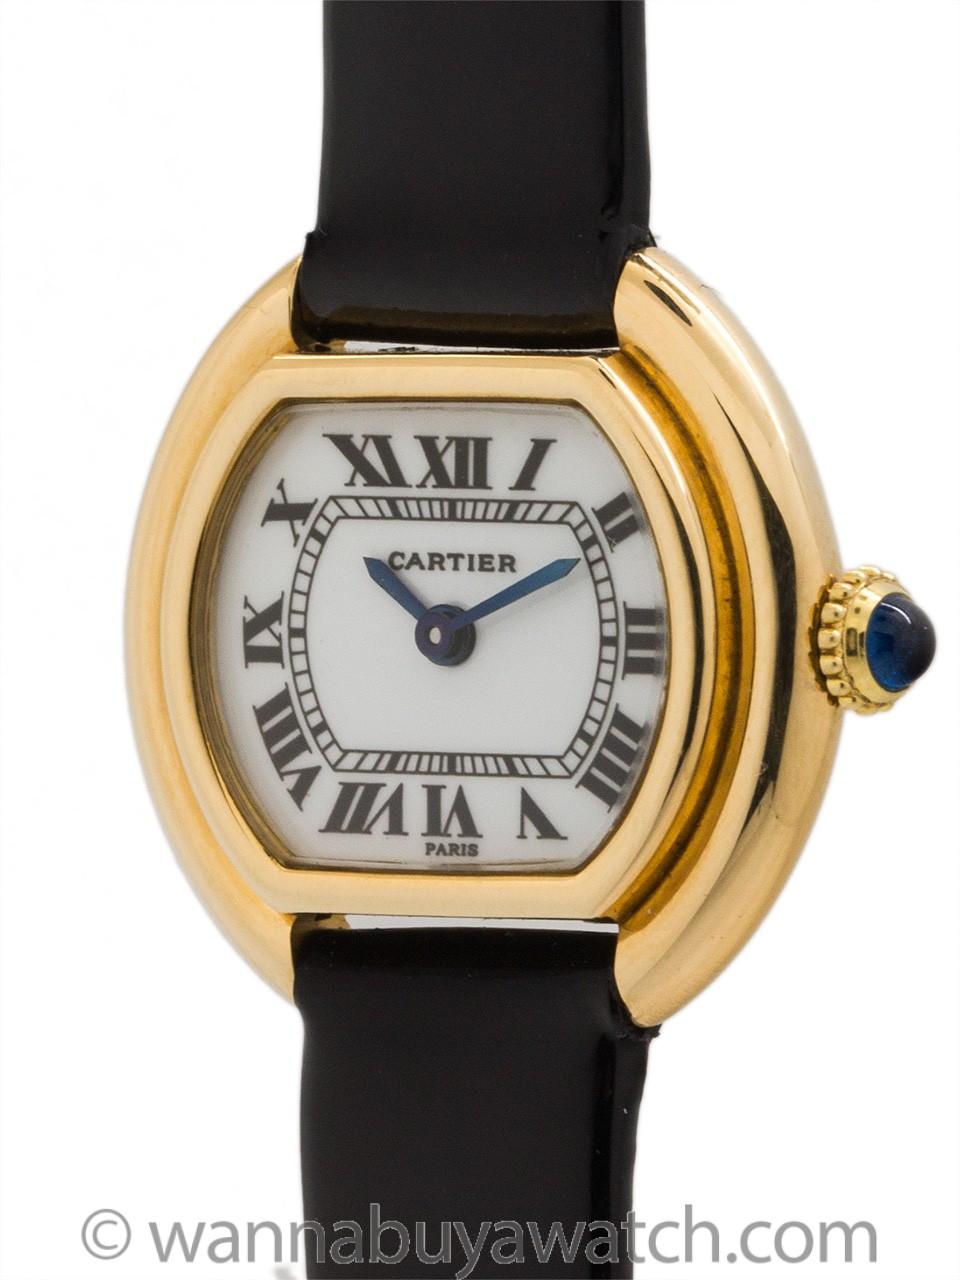 Cartier Lady 18K YG Vendome circa 1970's Enamel Dial